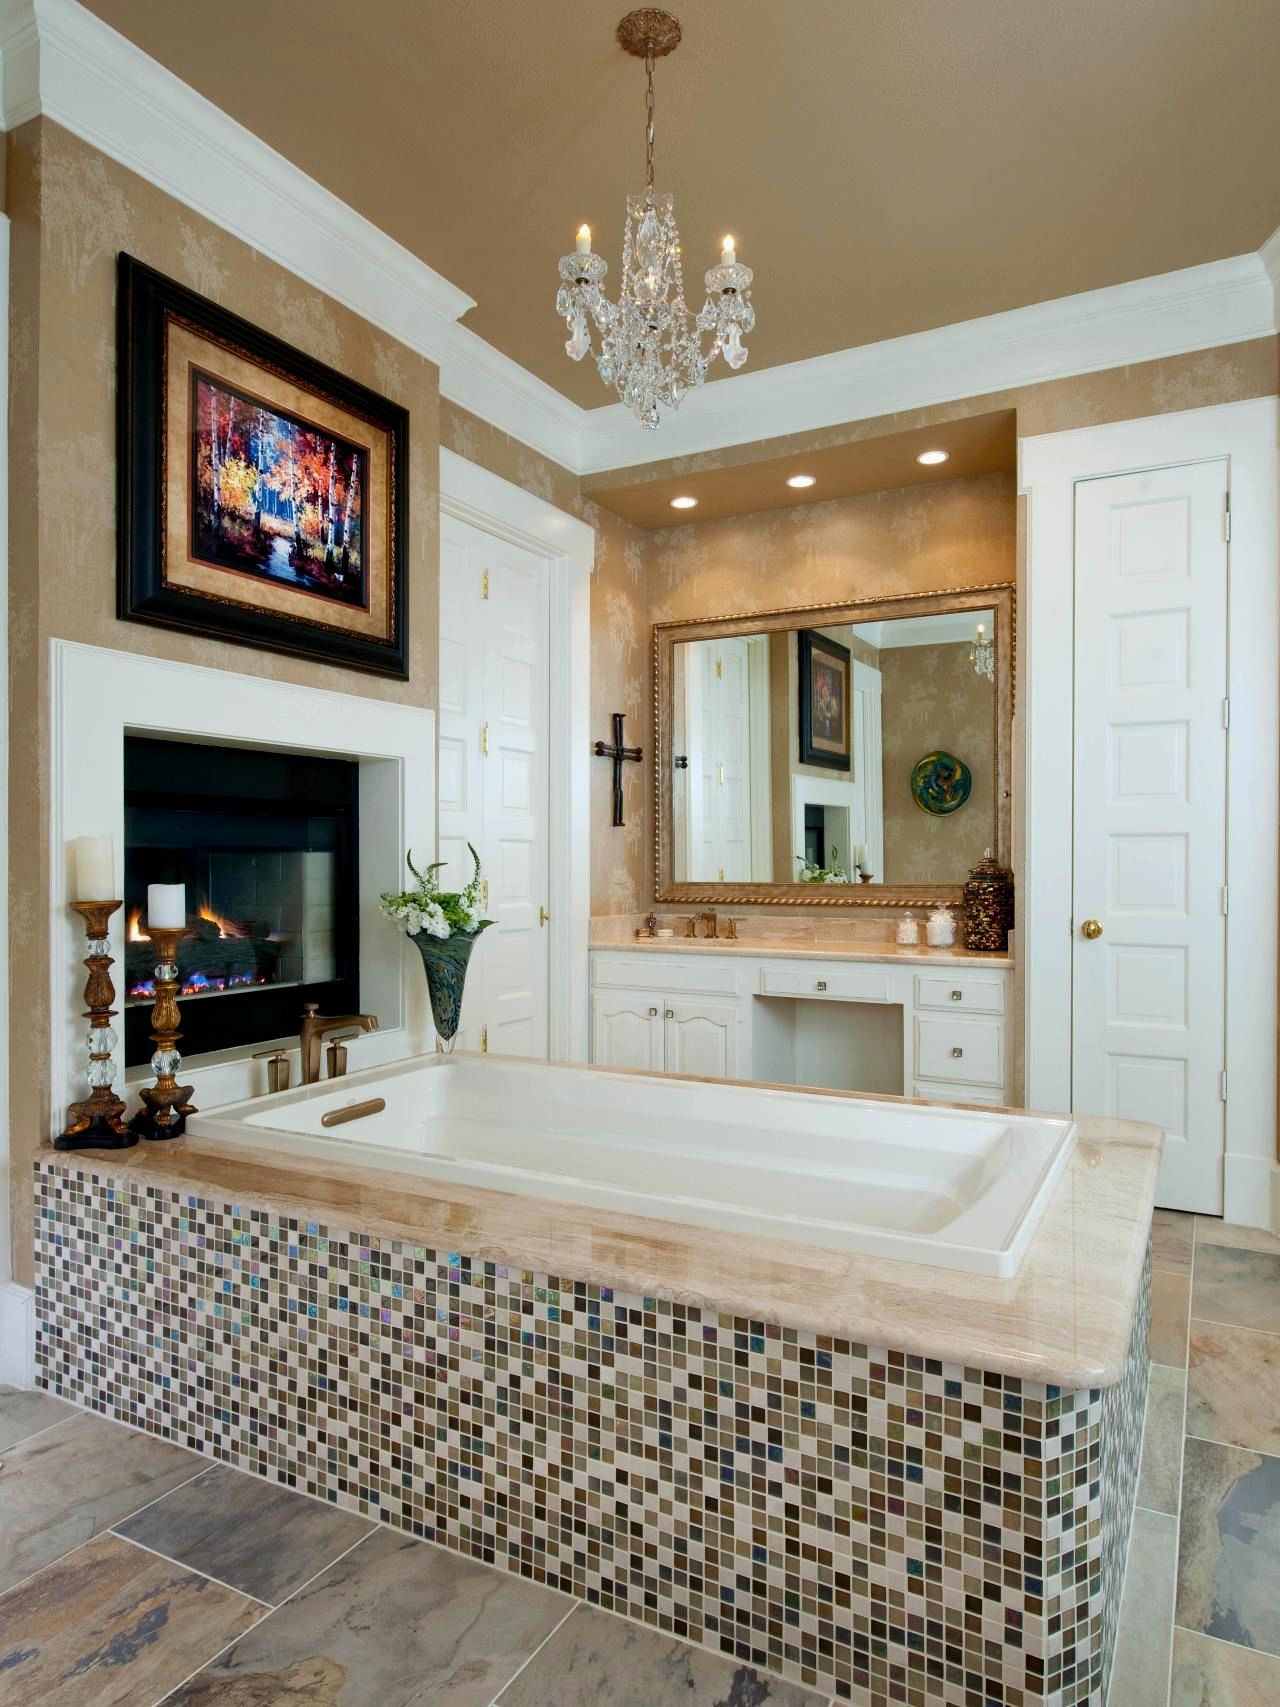 beautiful tile bathroom ideas wallpaper-Amazing Tile Bathroom Ideas Photograph